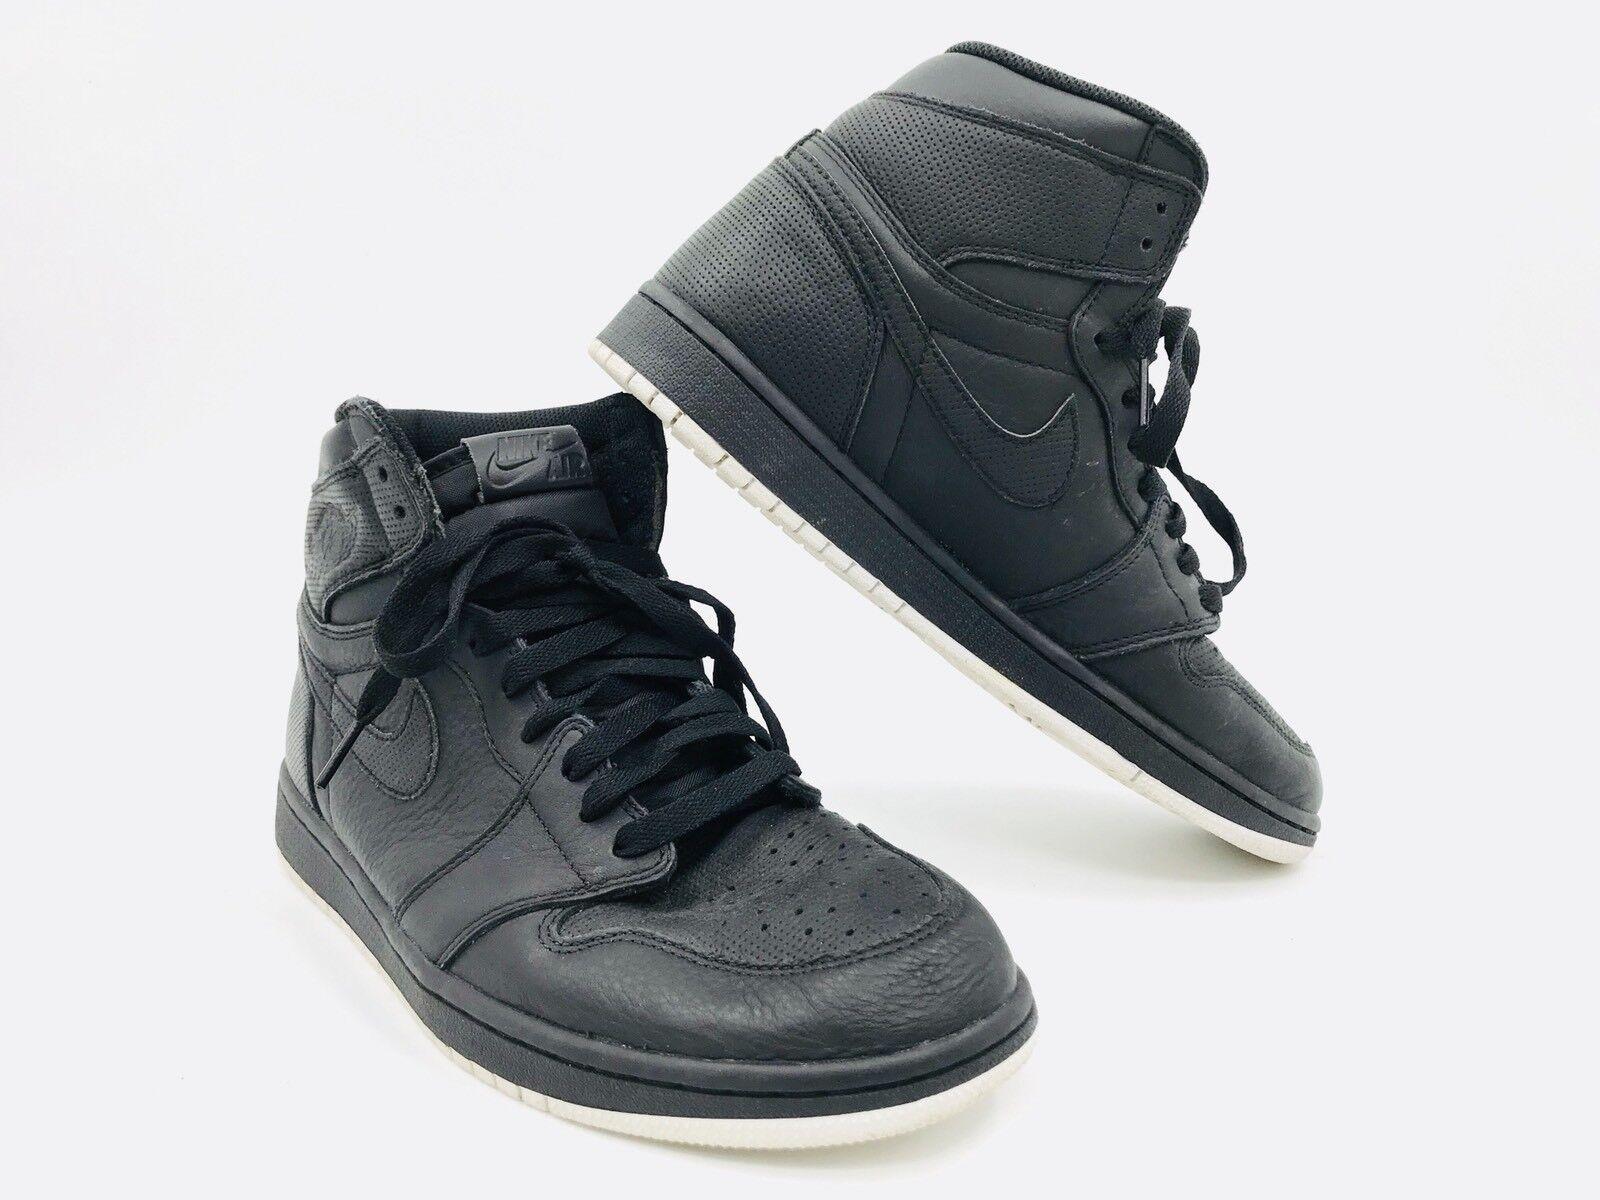 Nike Air Jordan 1 High 9,5 Og Negro hombre tamaño 9,5 High 3e2527